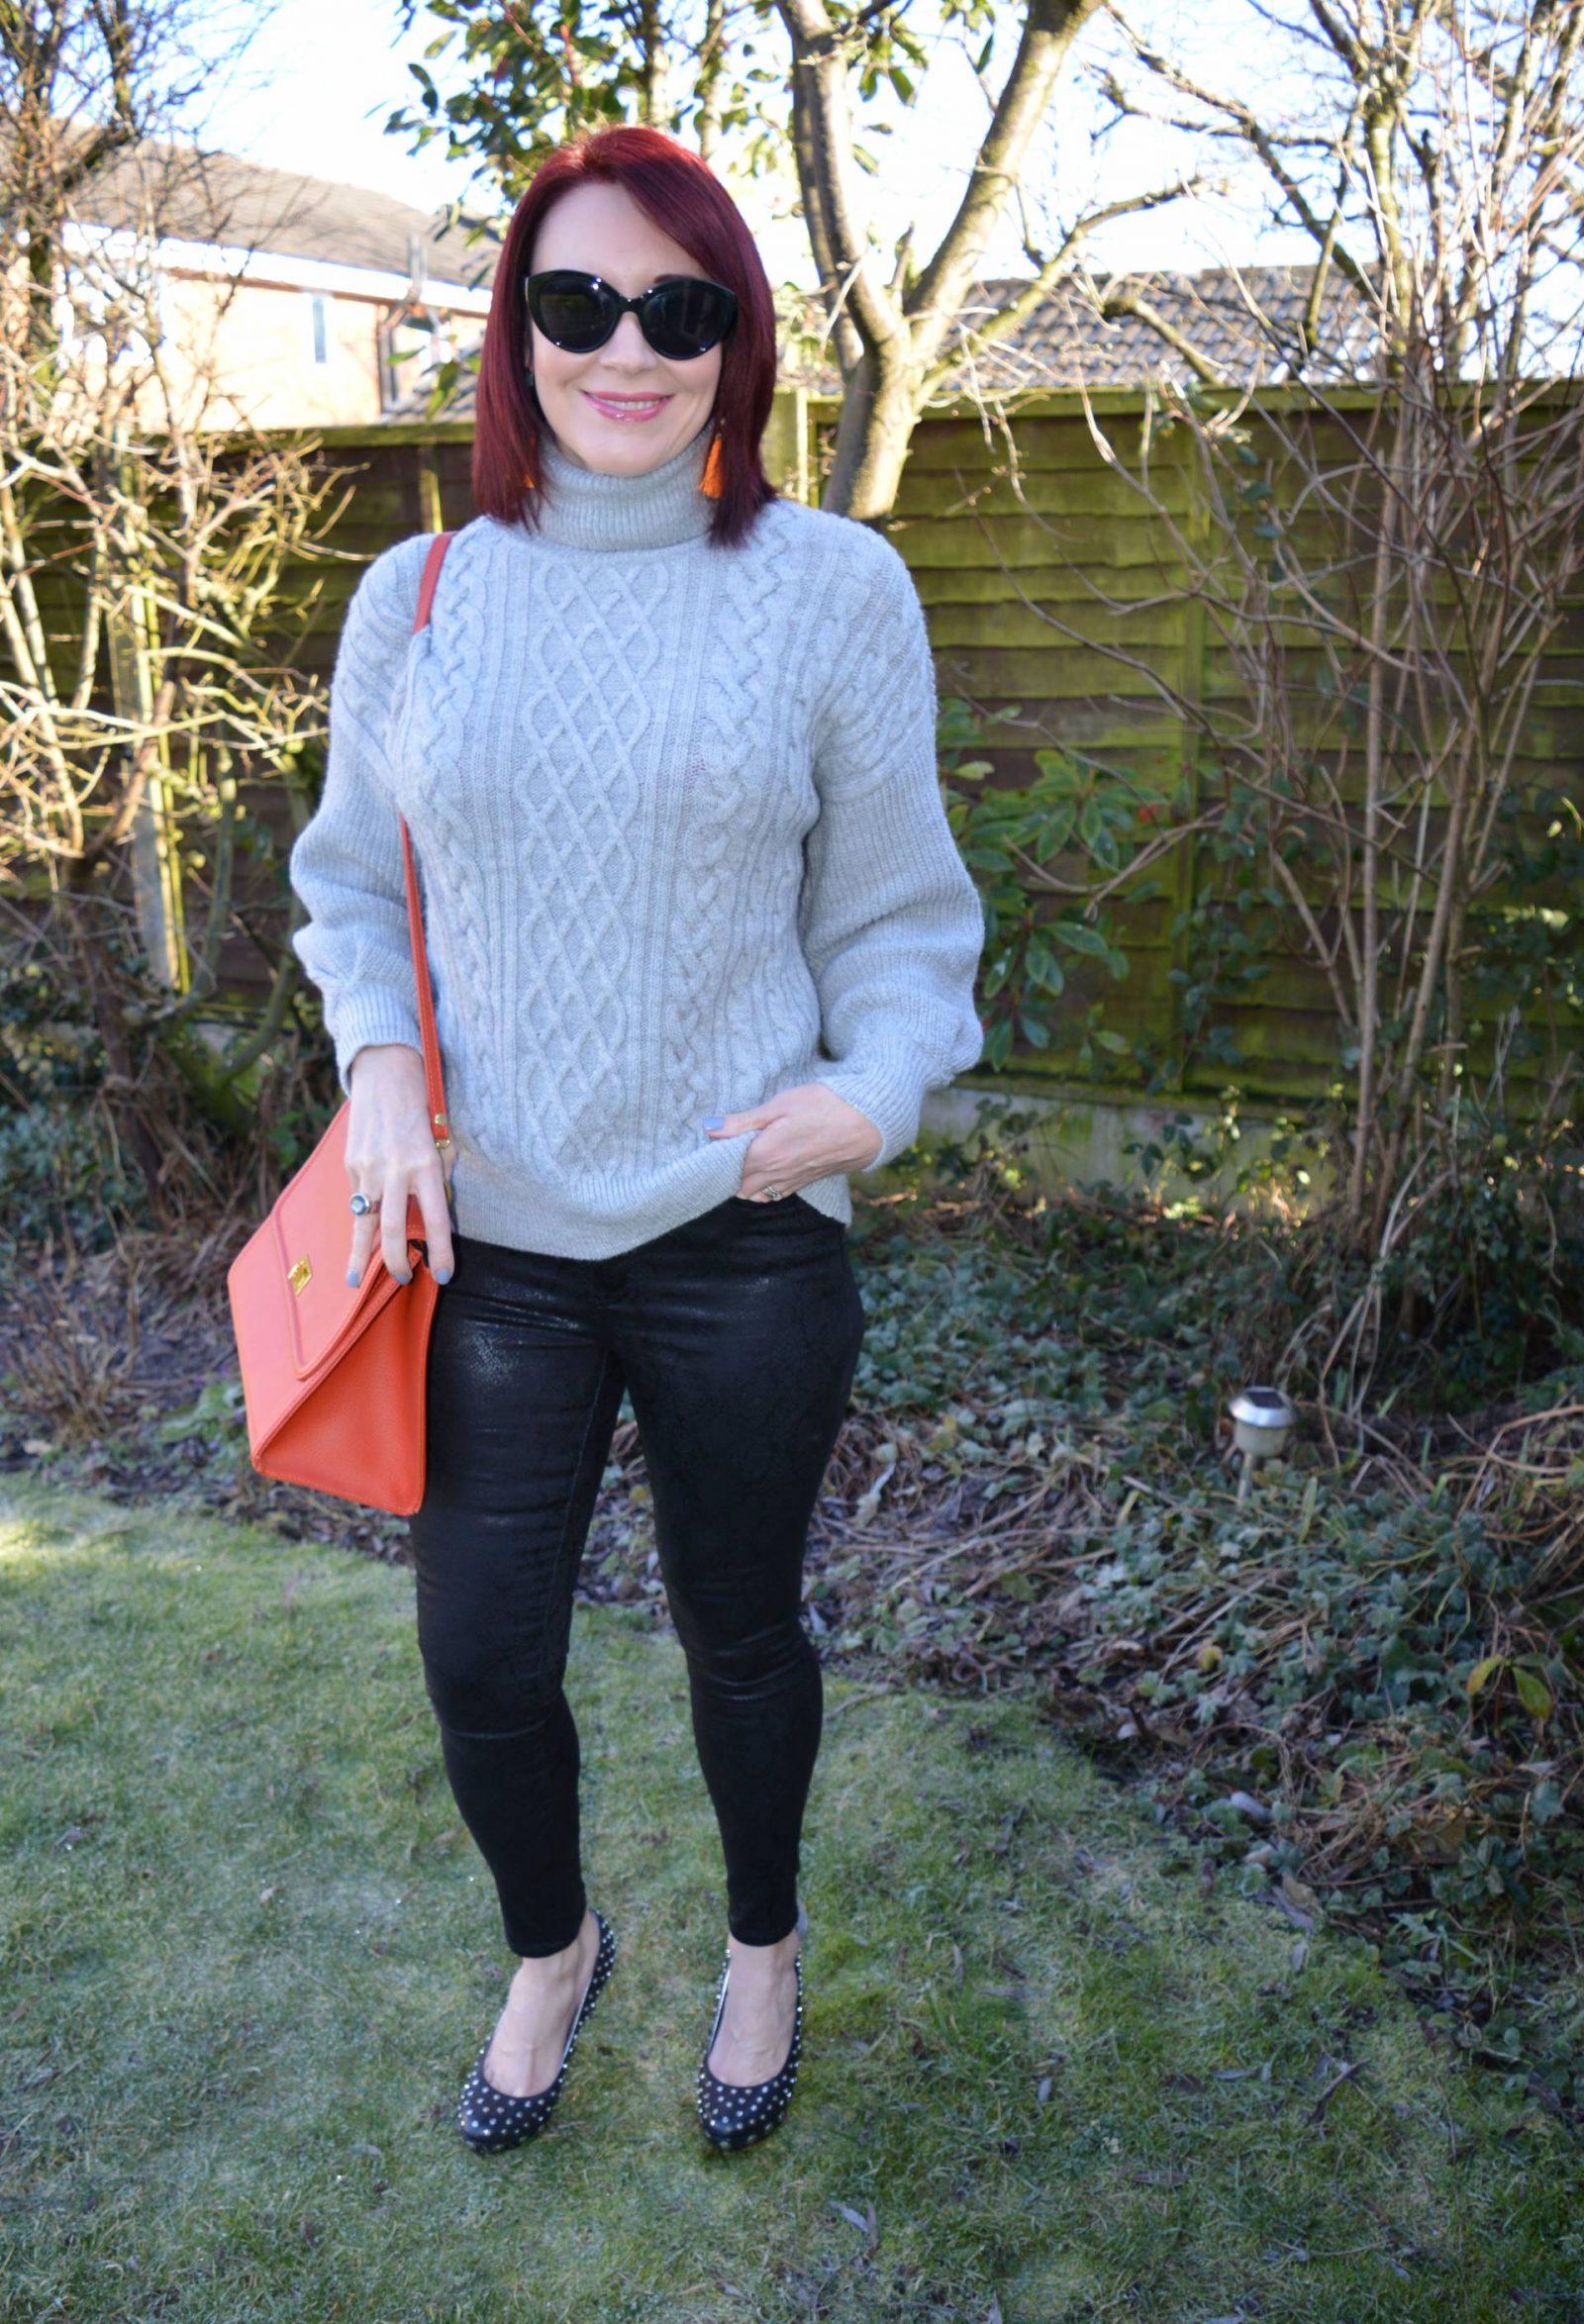 Snakeprint Skinny Jeans and Cable Knit Jumper Simply Be Chloe snakeprint skinny jeans, F&F grey cable knit jumper, Ted Baker studded shoes